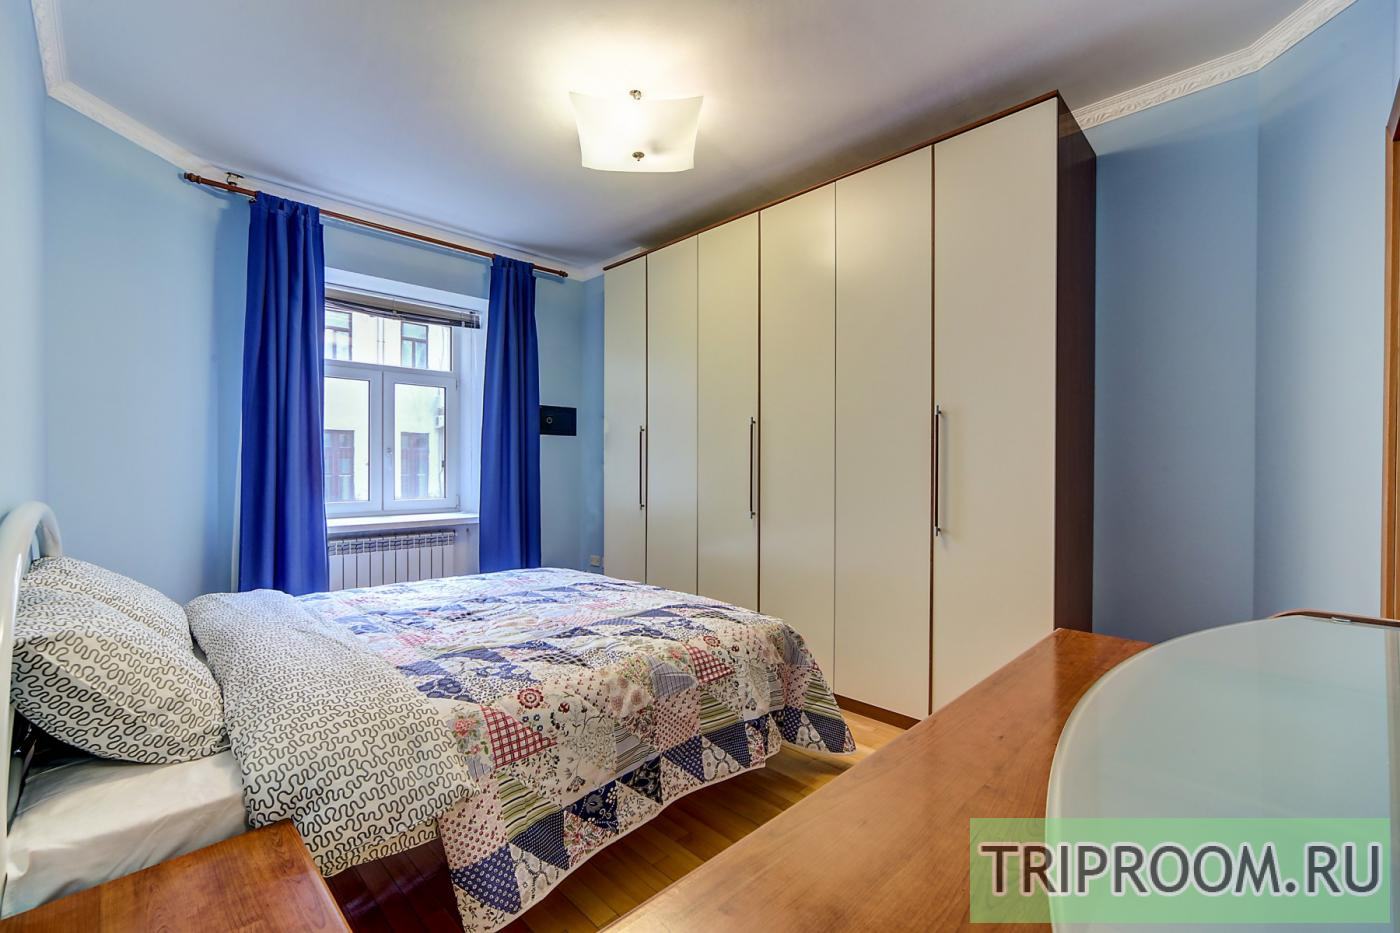 2-комнатная квартира посуточно (вариант № 20143), ул. Невский проспект, фото № 8